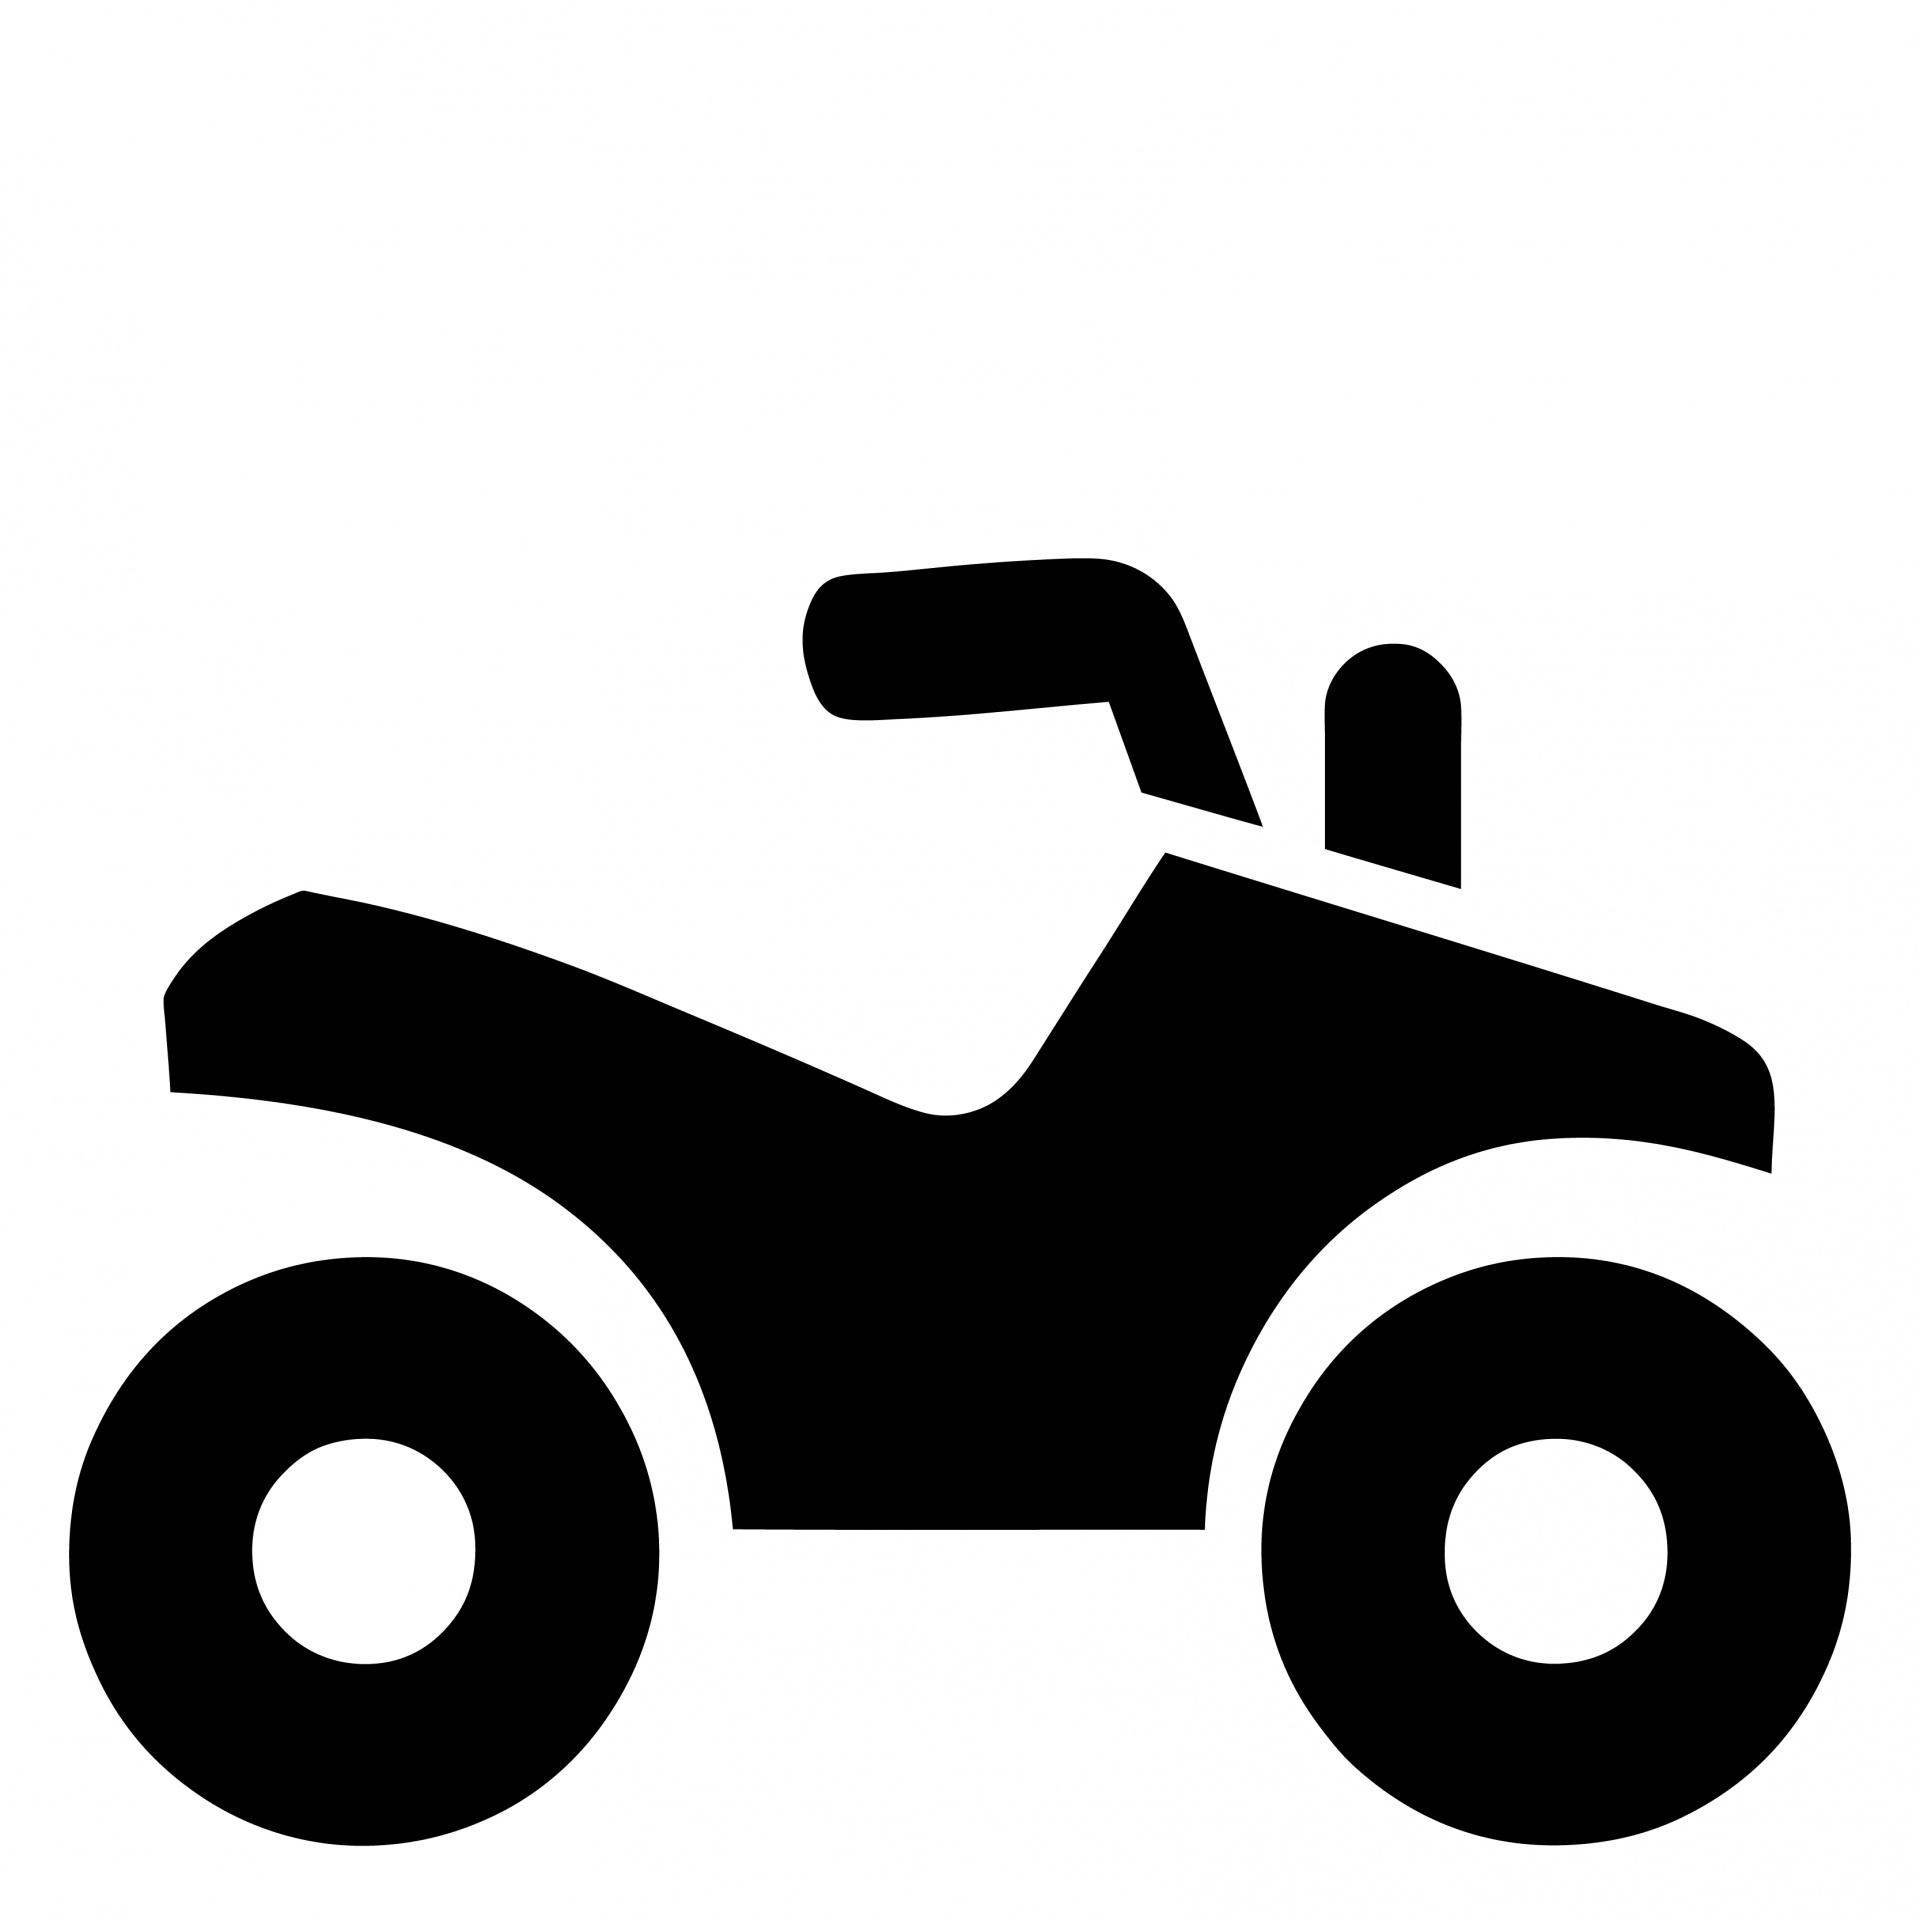 car silhouette clip art at getdrawings com free for personal use rh getdrawings com free clipart avocado free clipart advent season